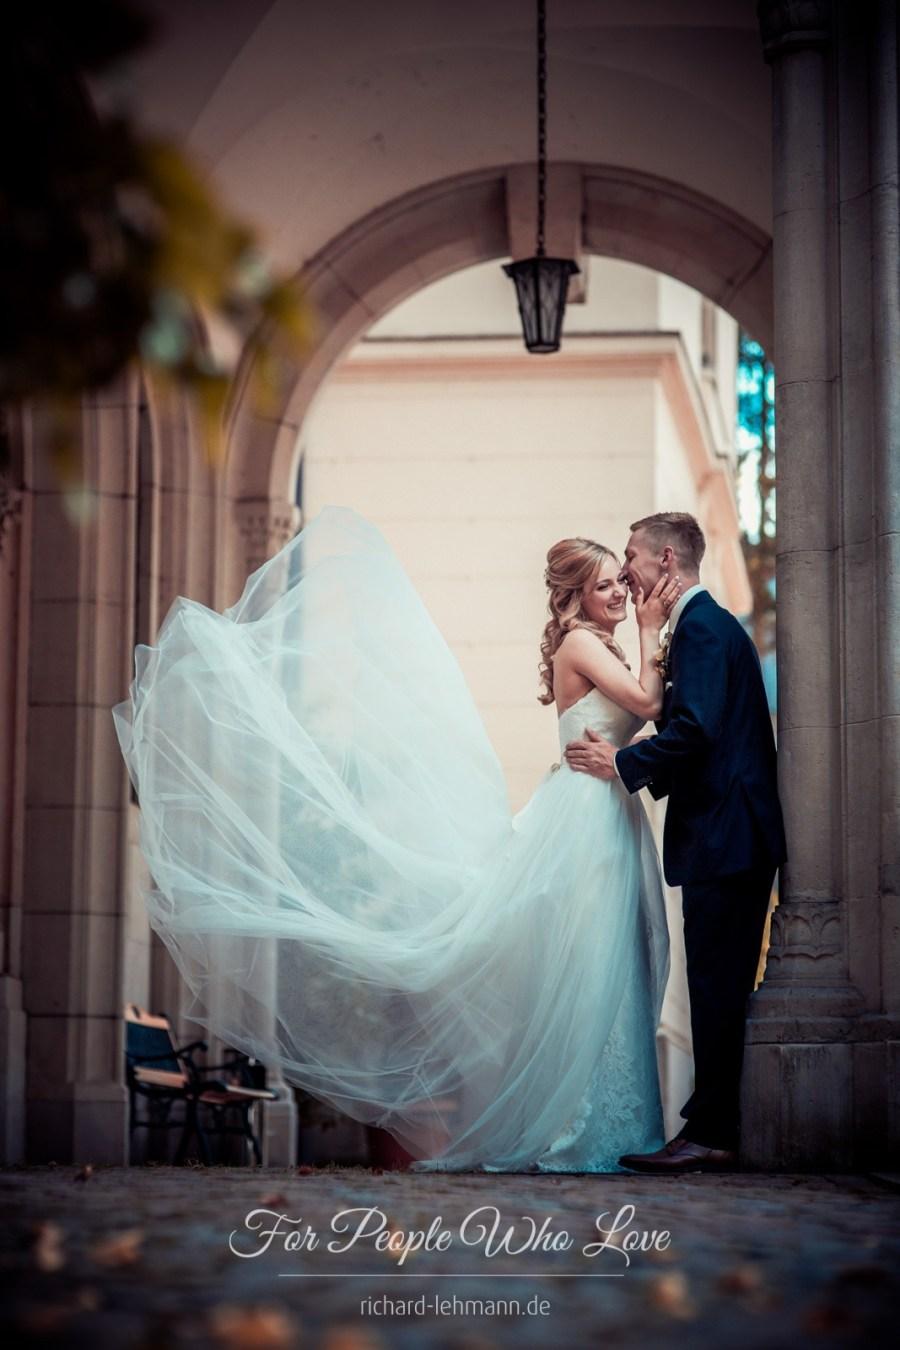 Hochzeitsfotograf-Richard-Lehmann-0244-2